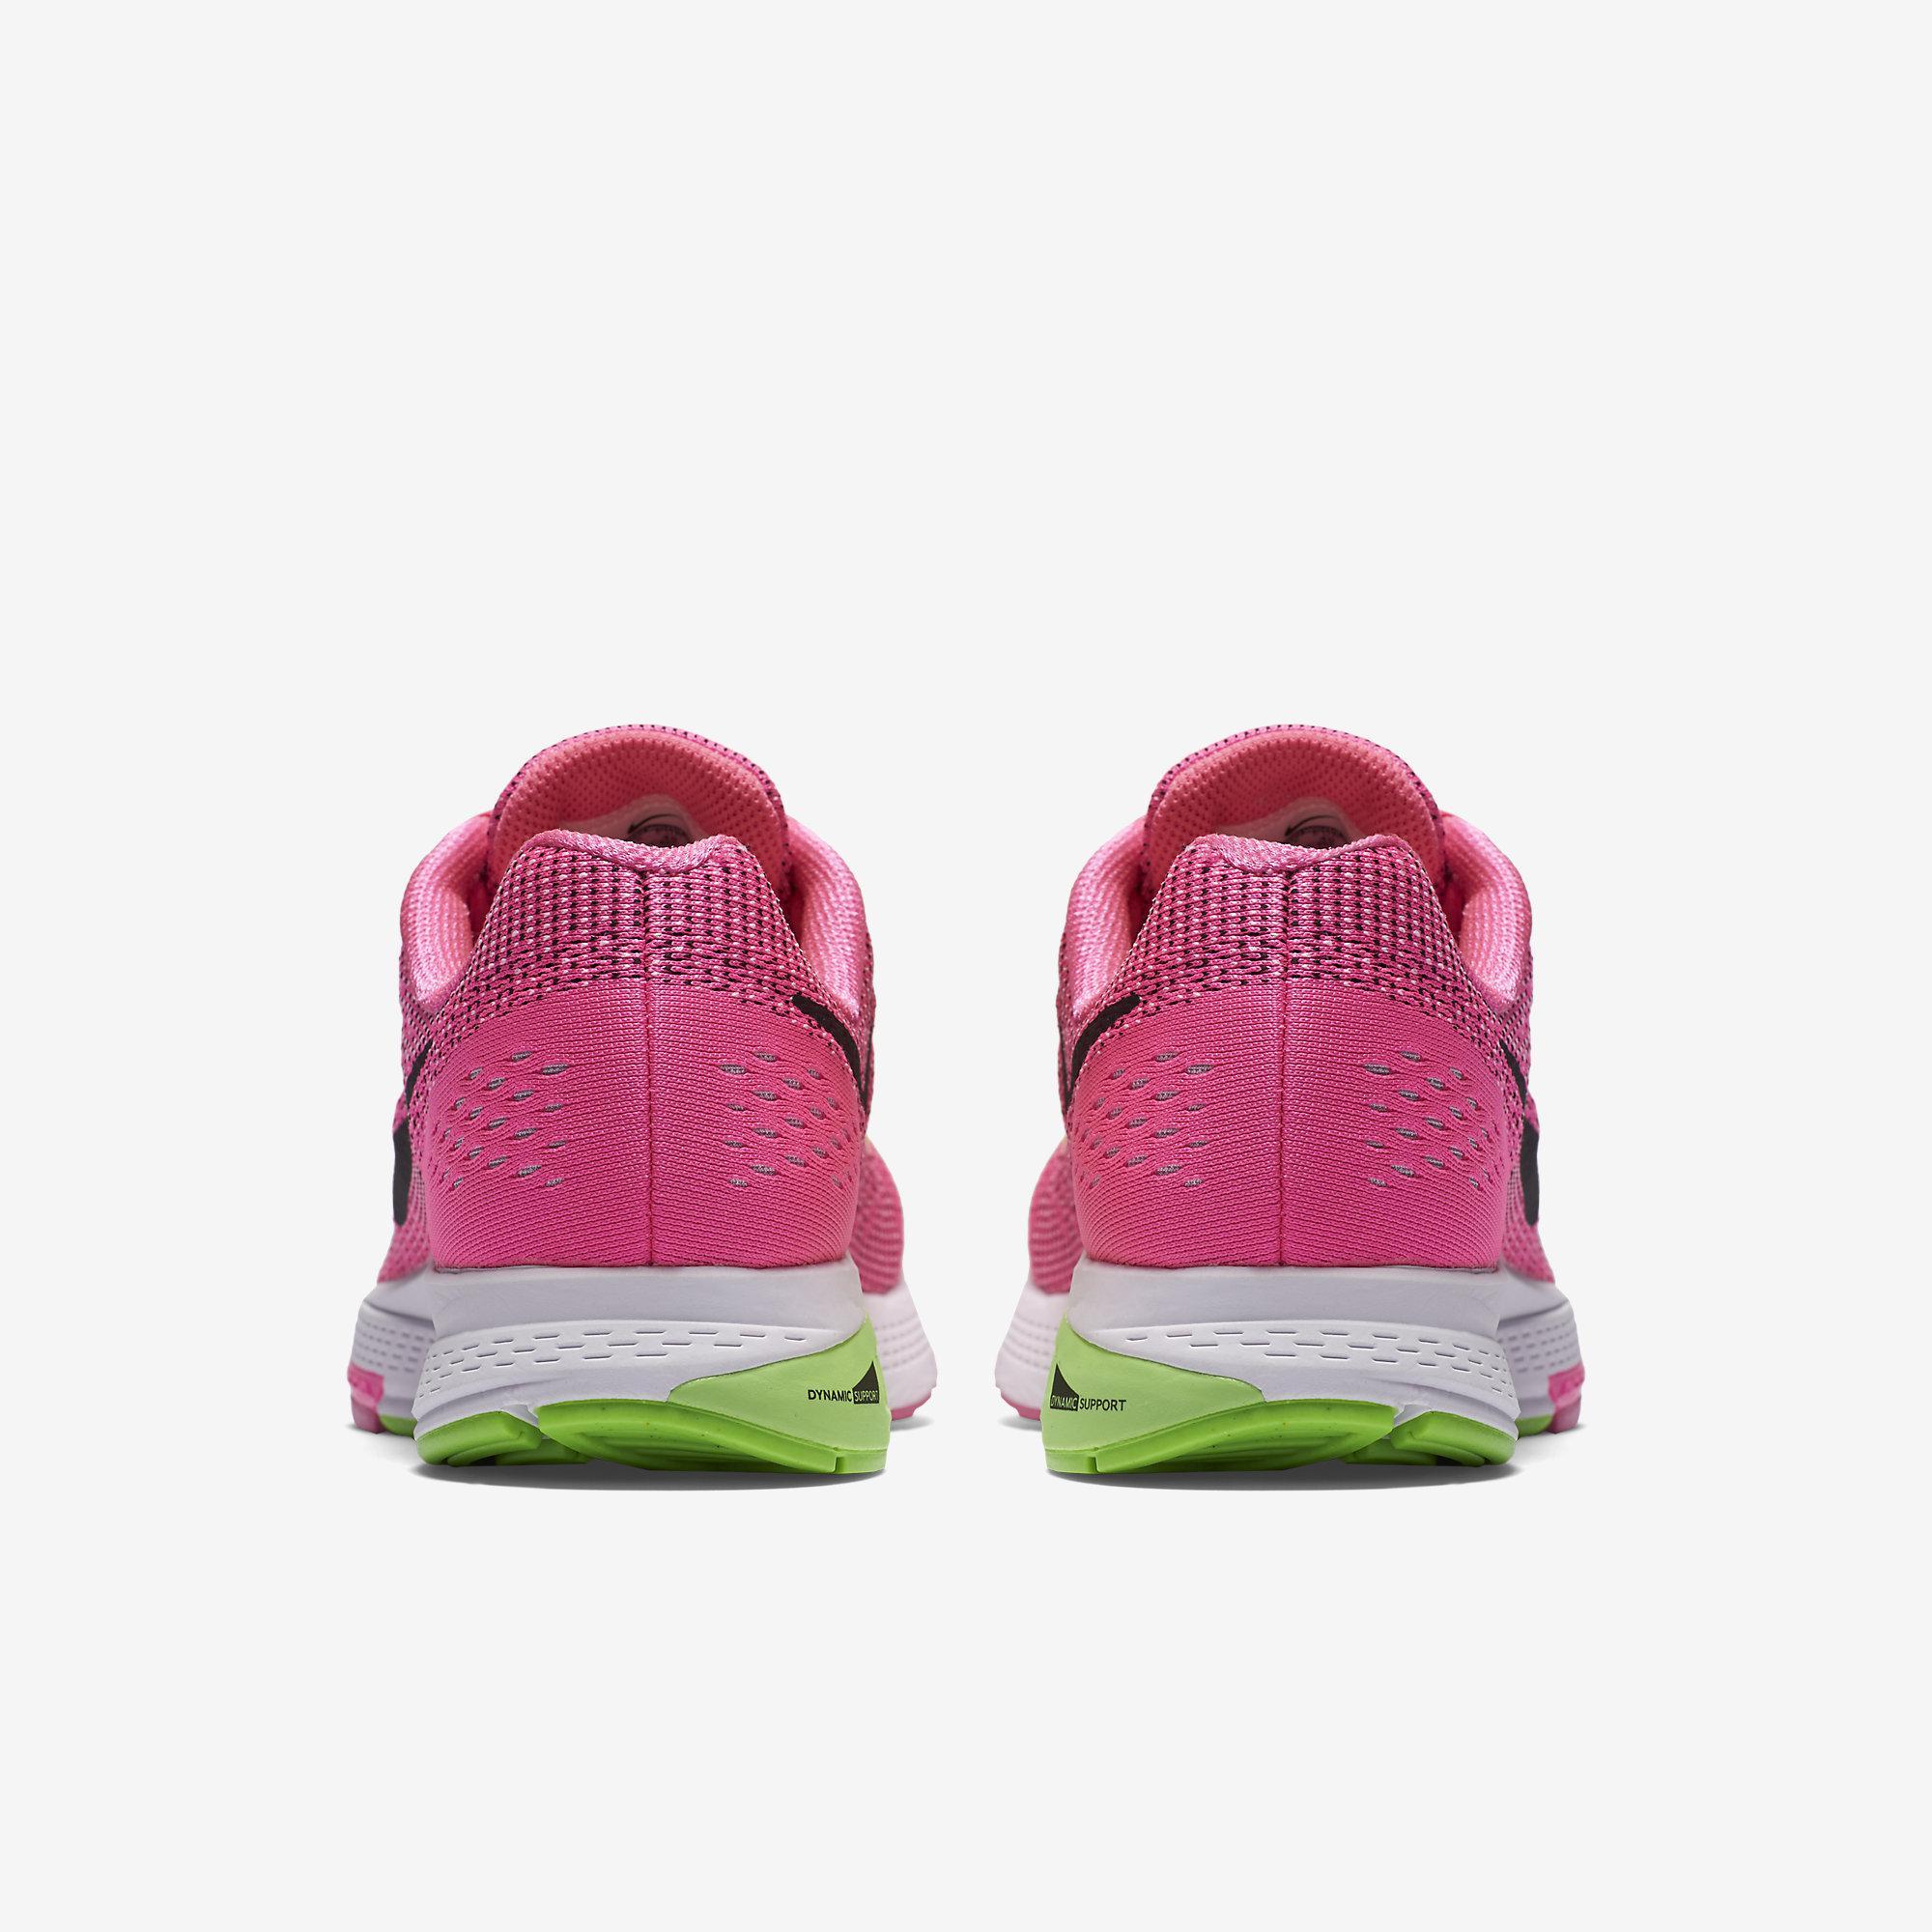 511ebd80d846 Nike Womens Air Zoom Structure 19 Running Shoes - Pink - Tennisnuts.com